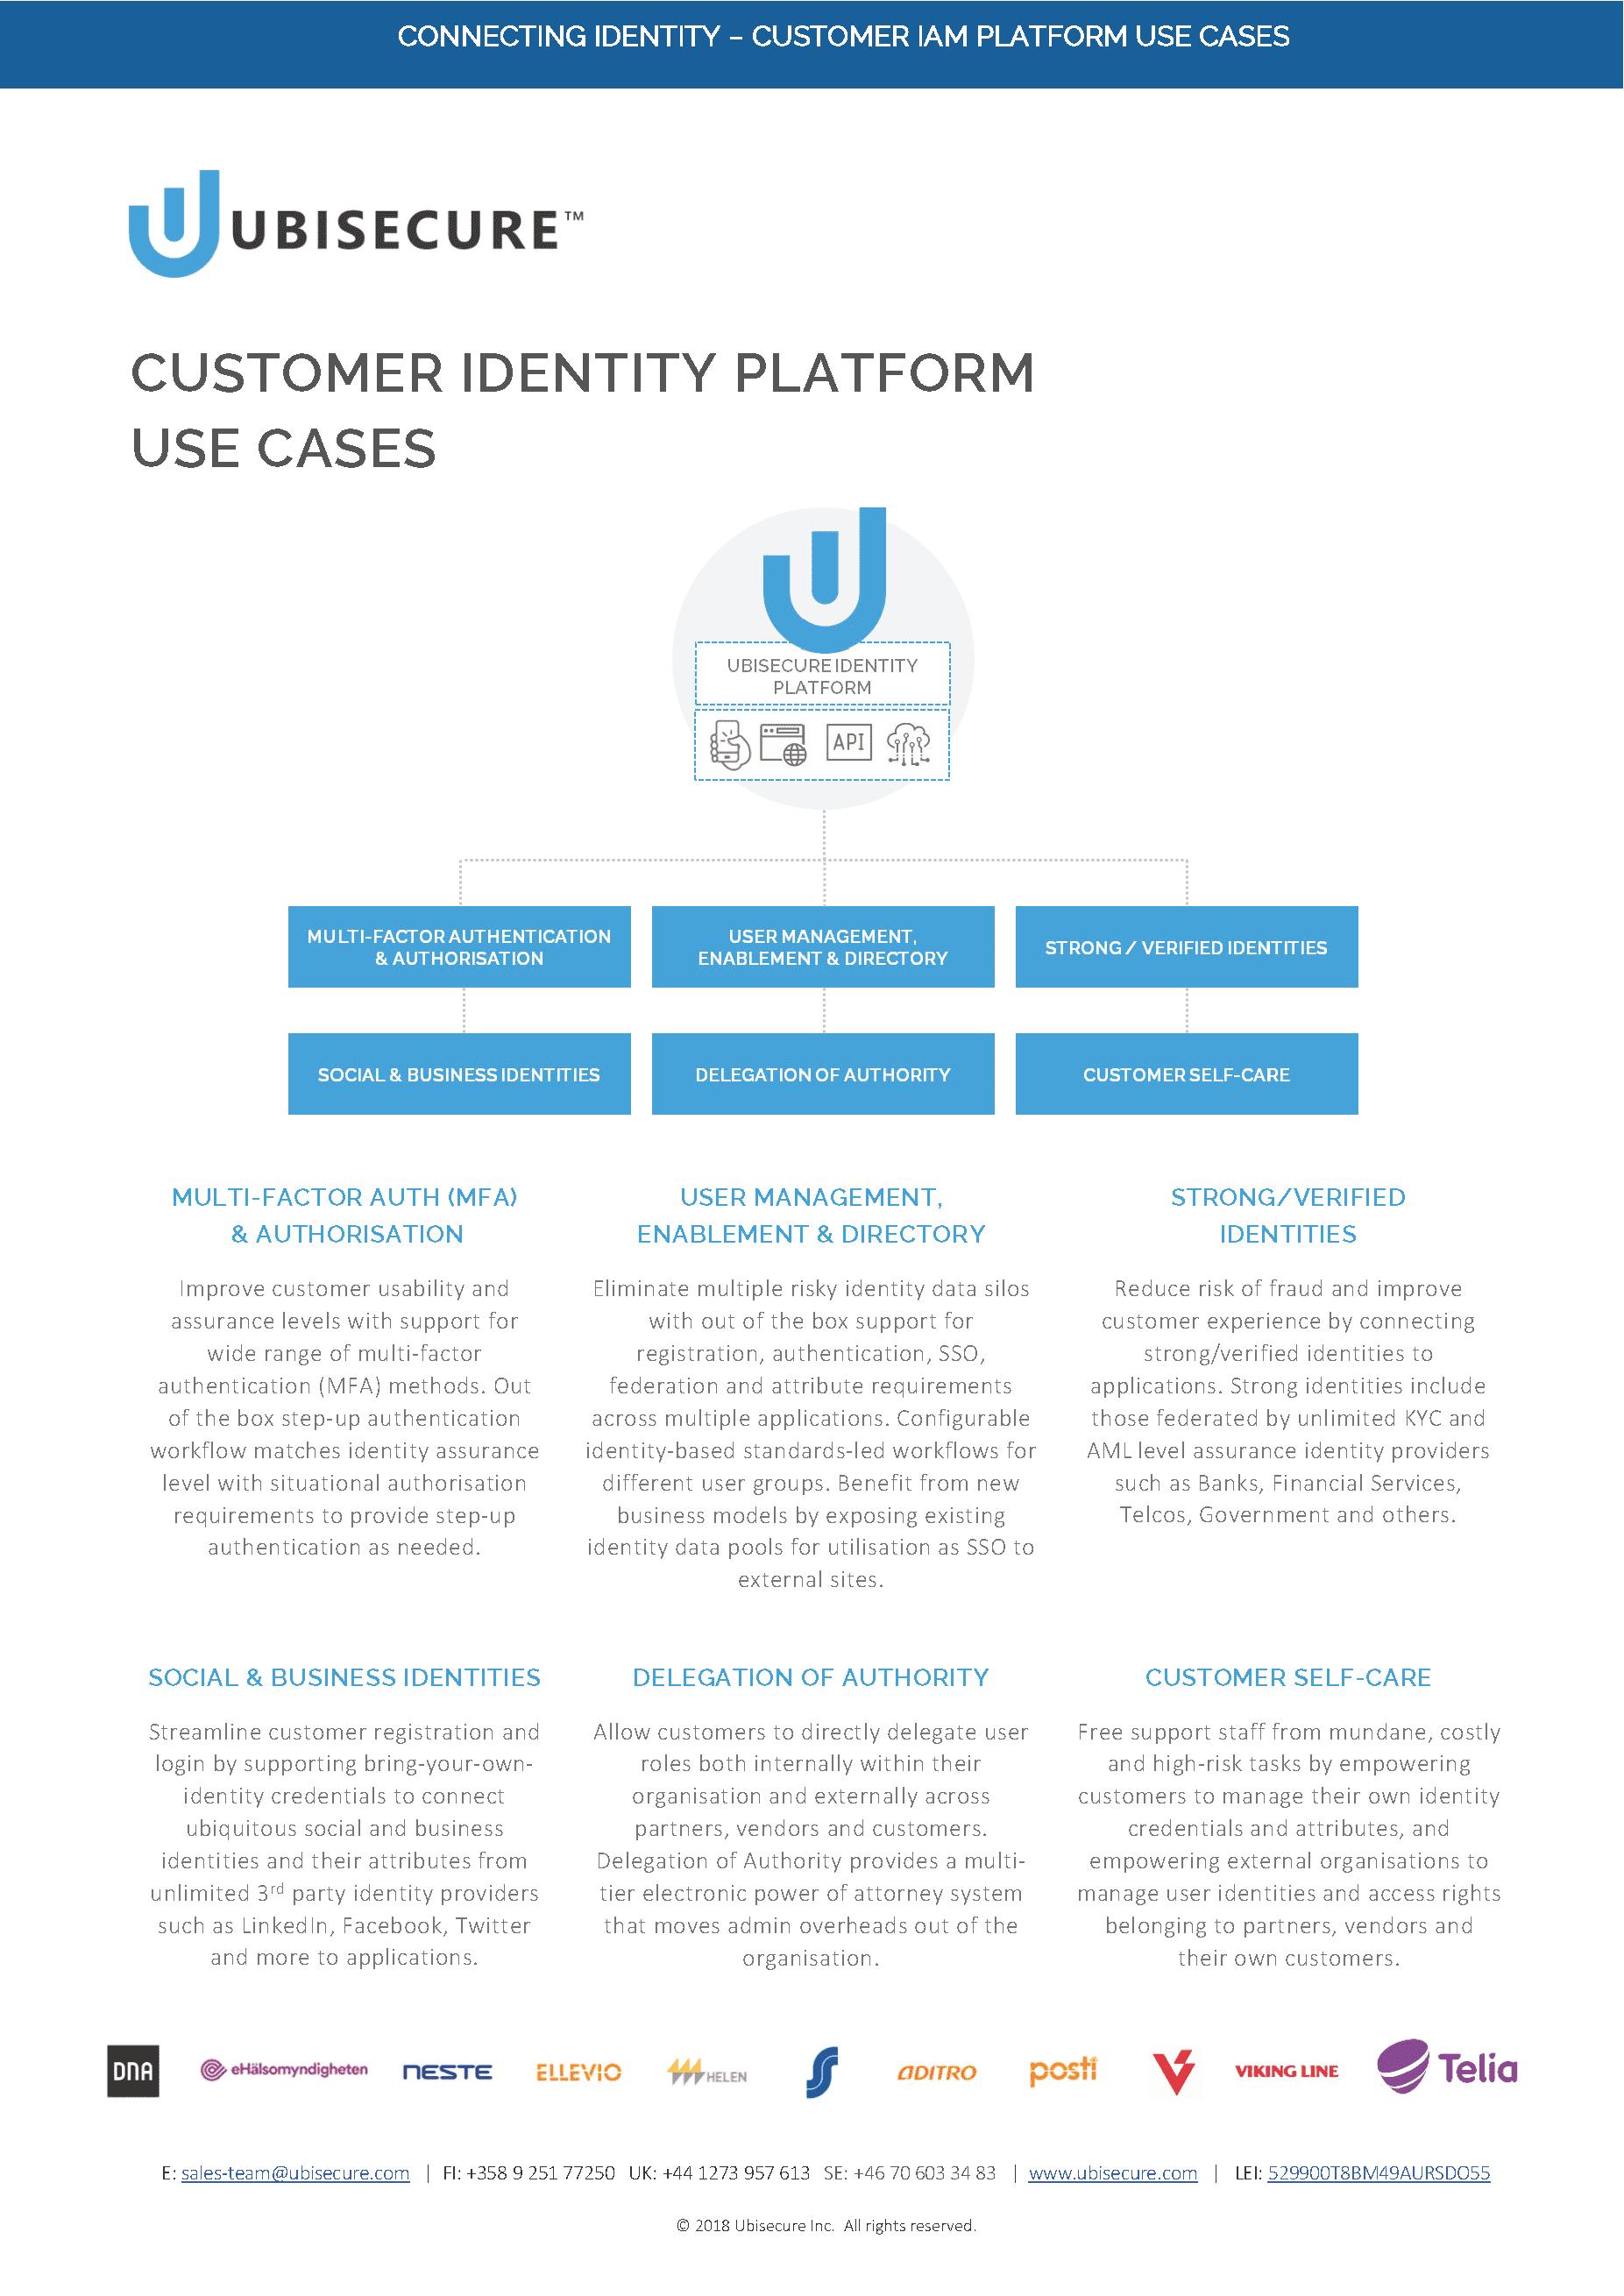 use case summary page 1